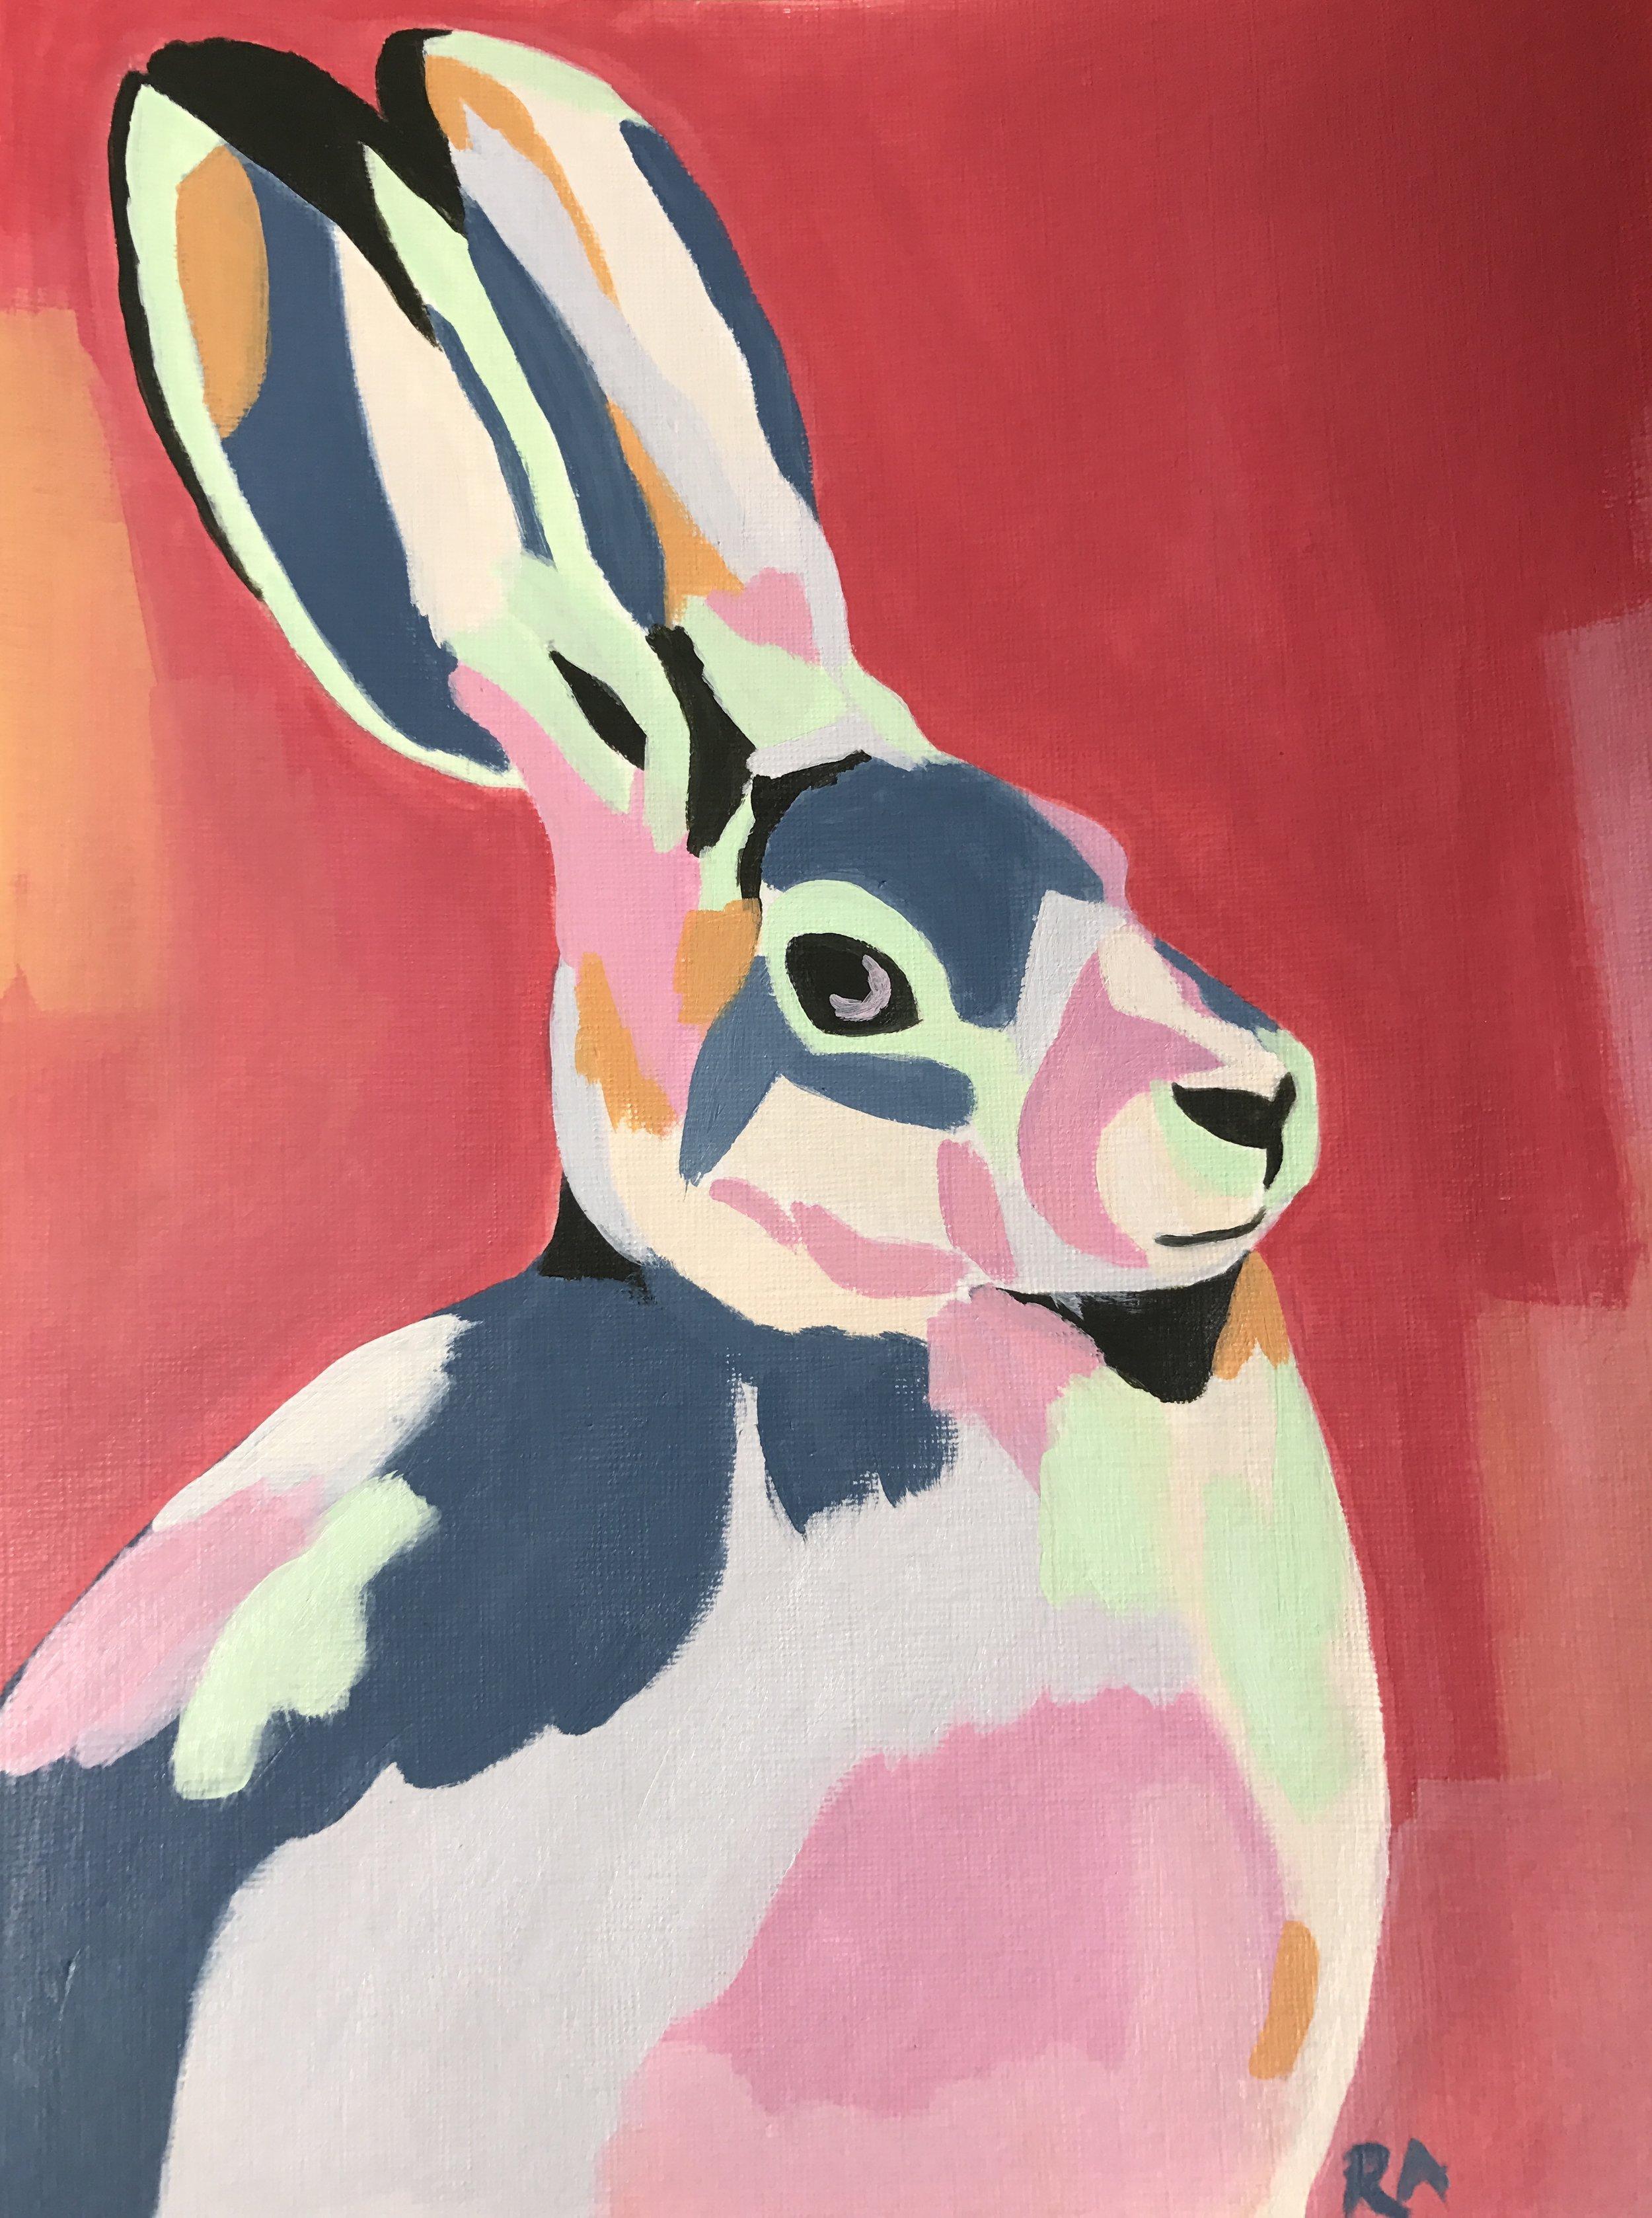 Rainbow Rabbit, acrylic on paper, 2016